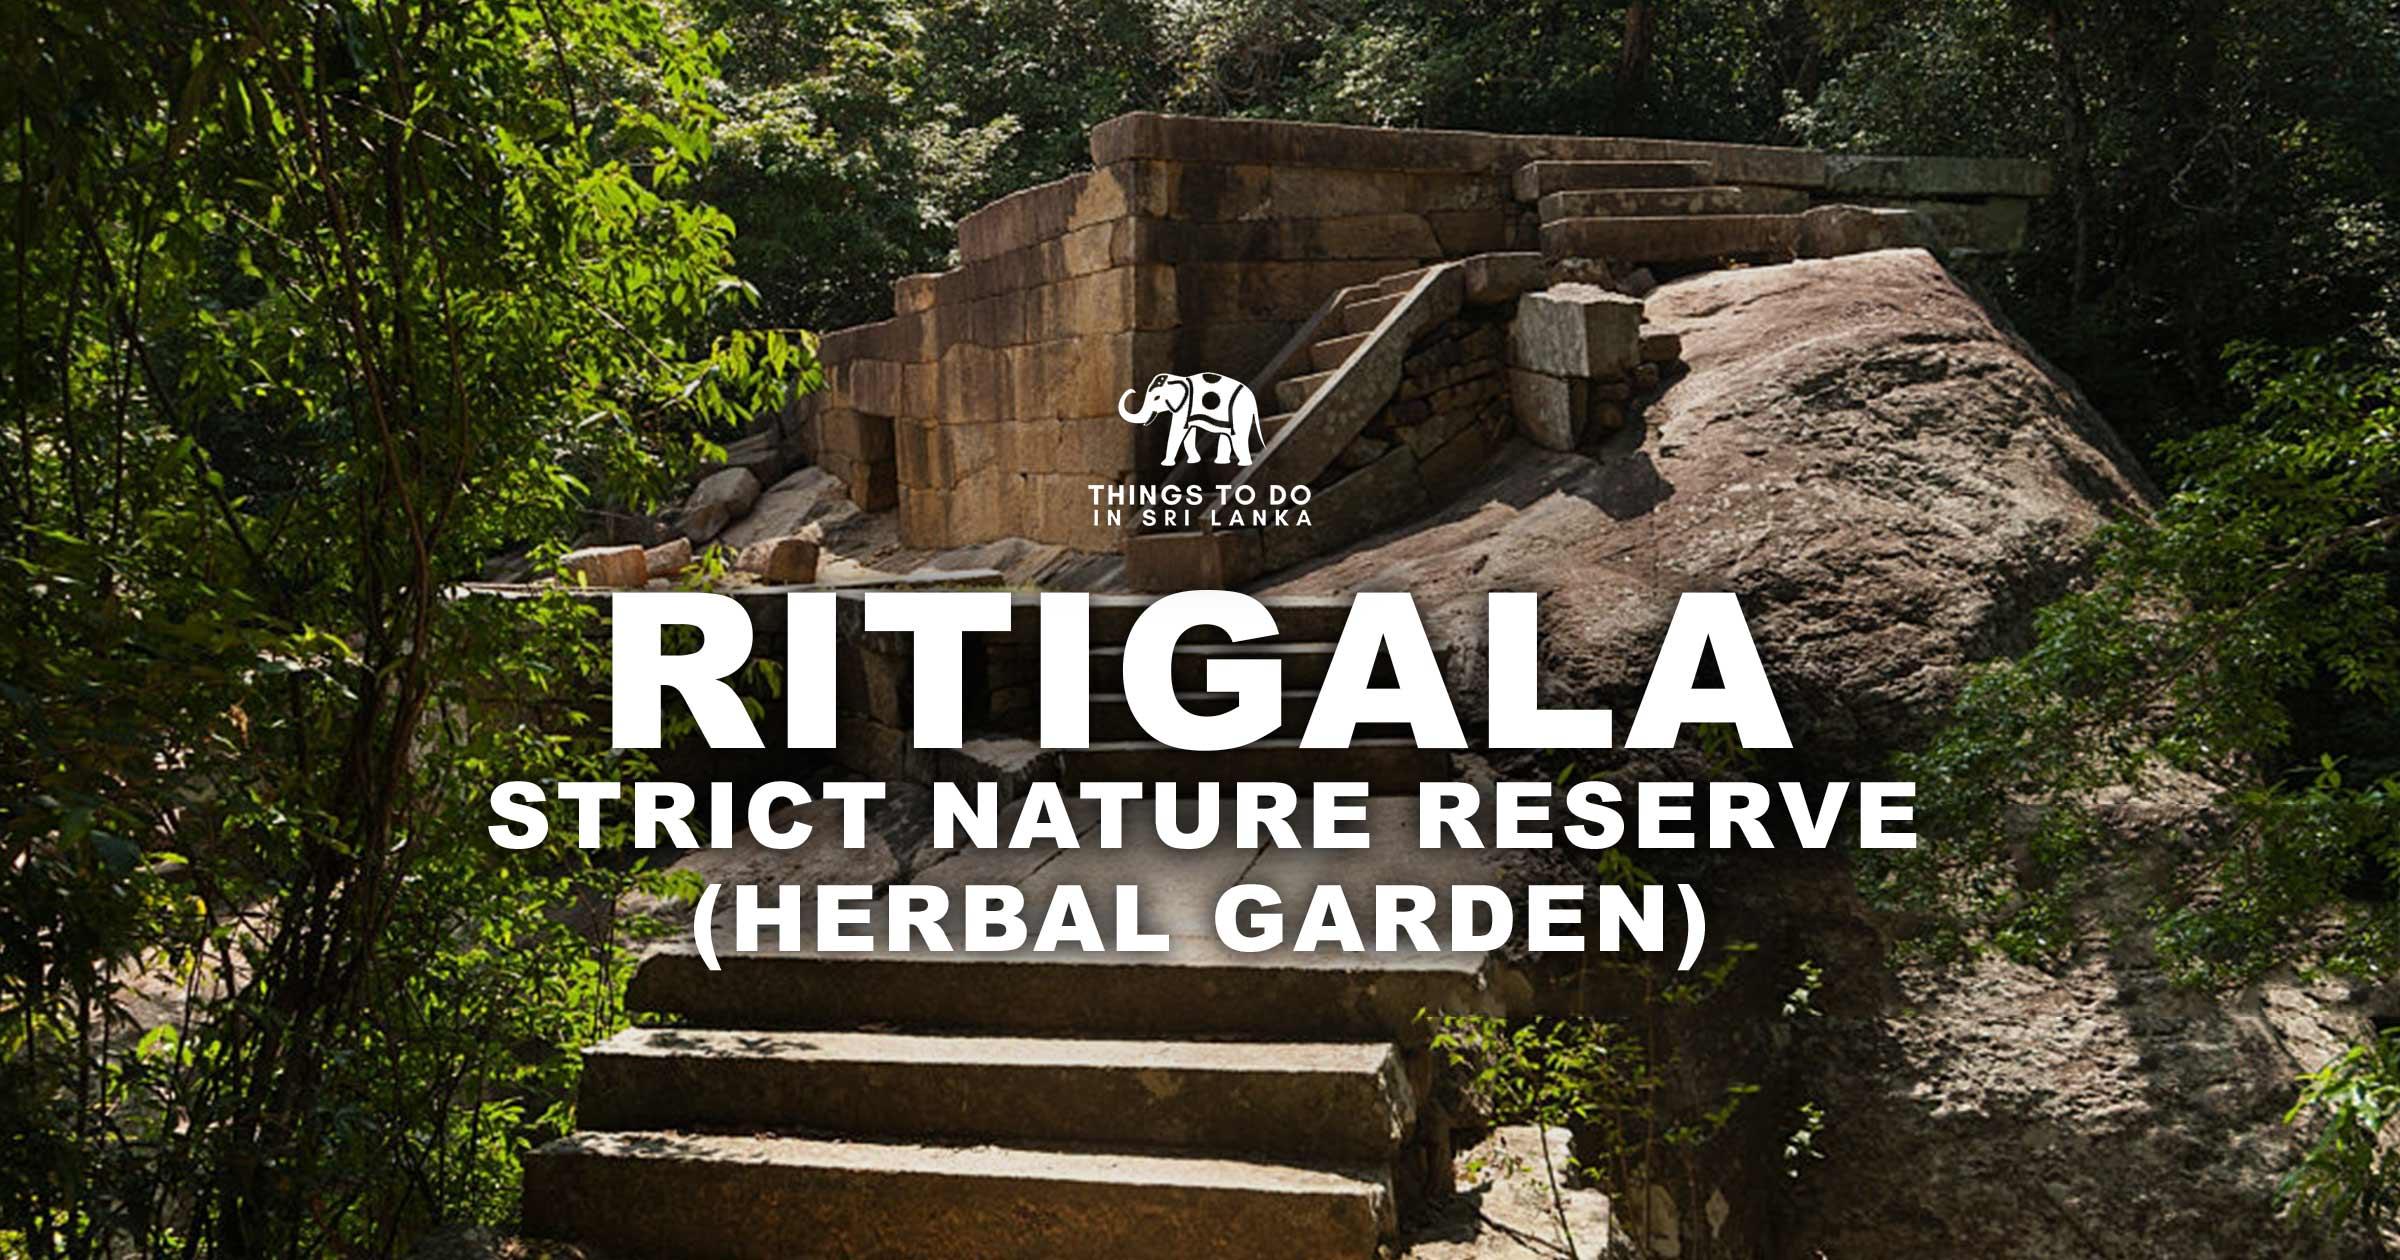 Ritigala Strict Nature Reserve (Herbal Garden)